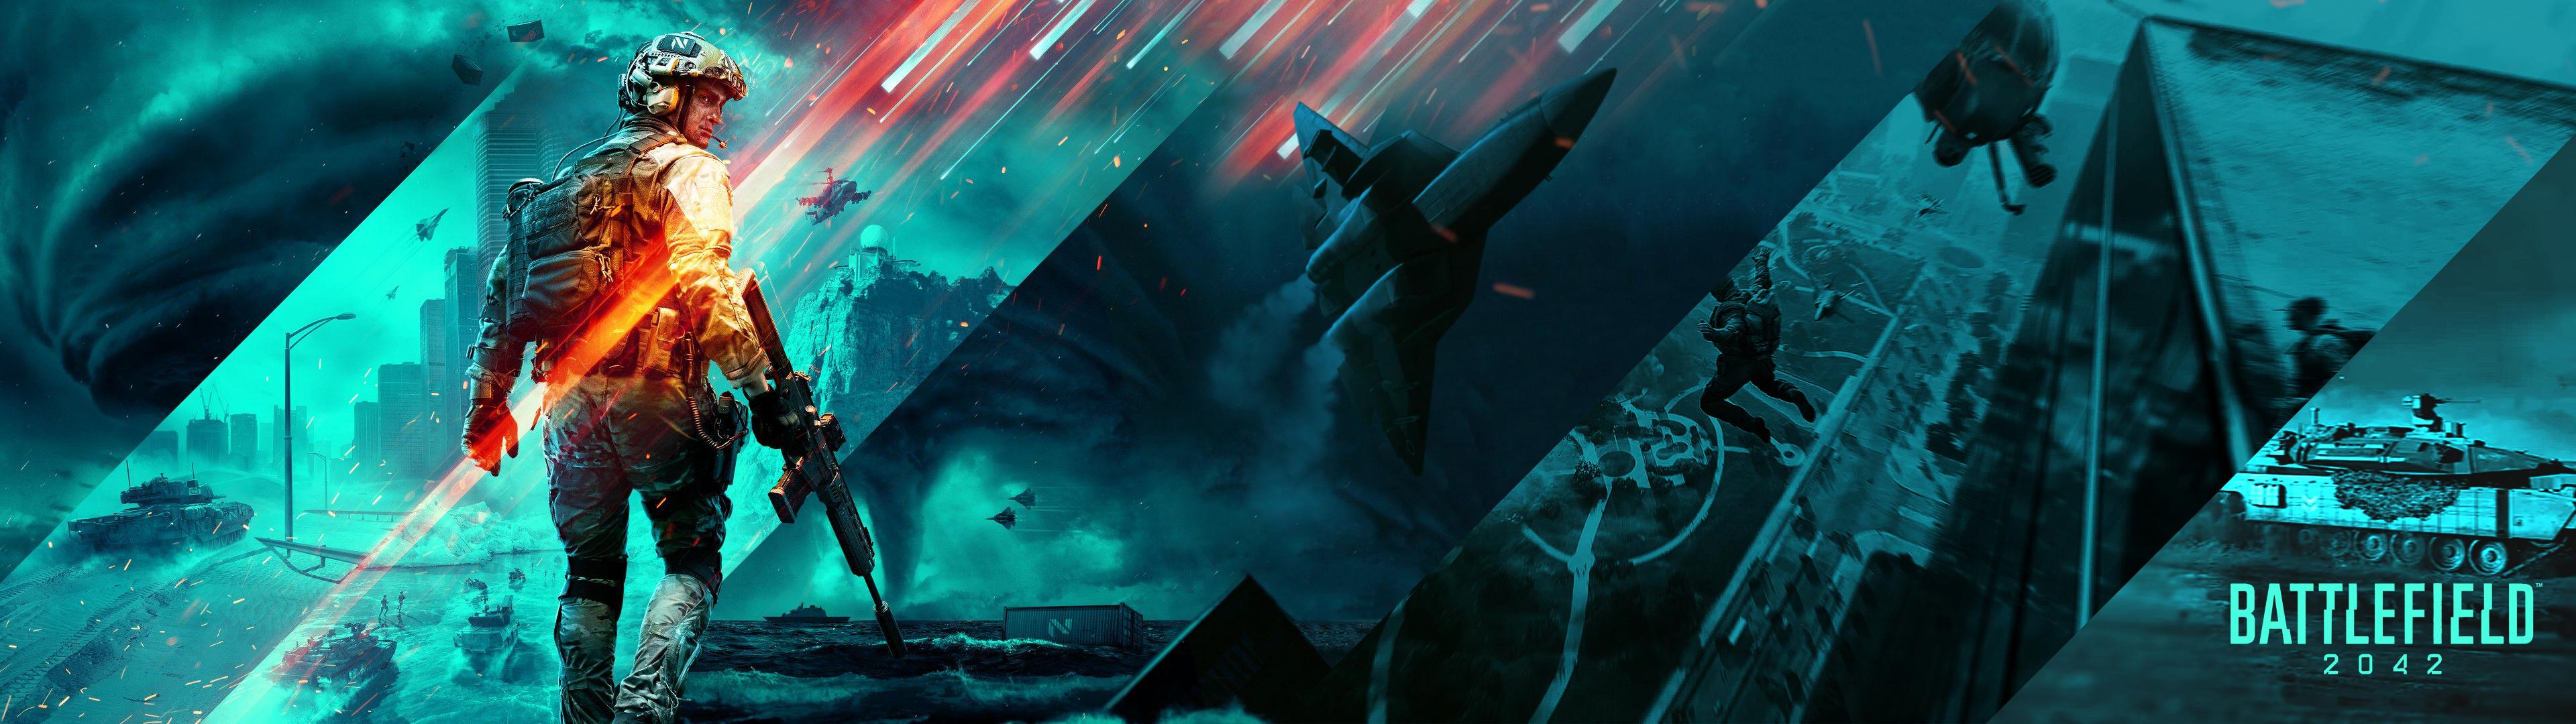 Battlefield 2042 widescreen fan made Wallpaper battlefield2042 3840x1080